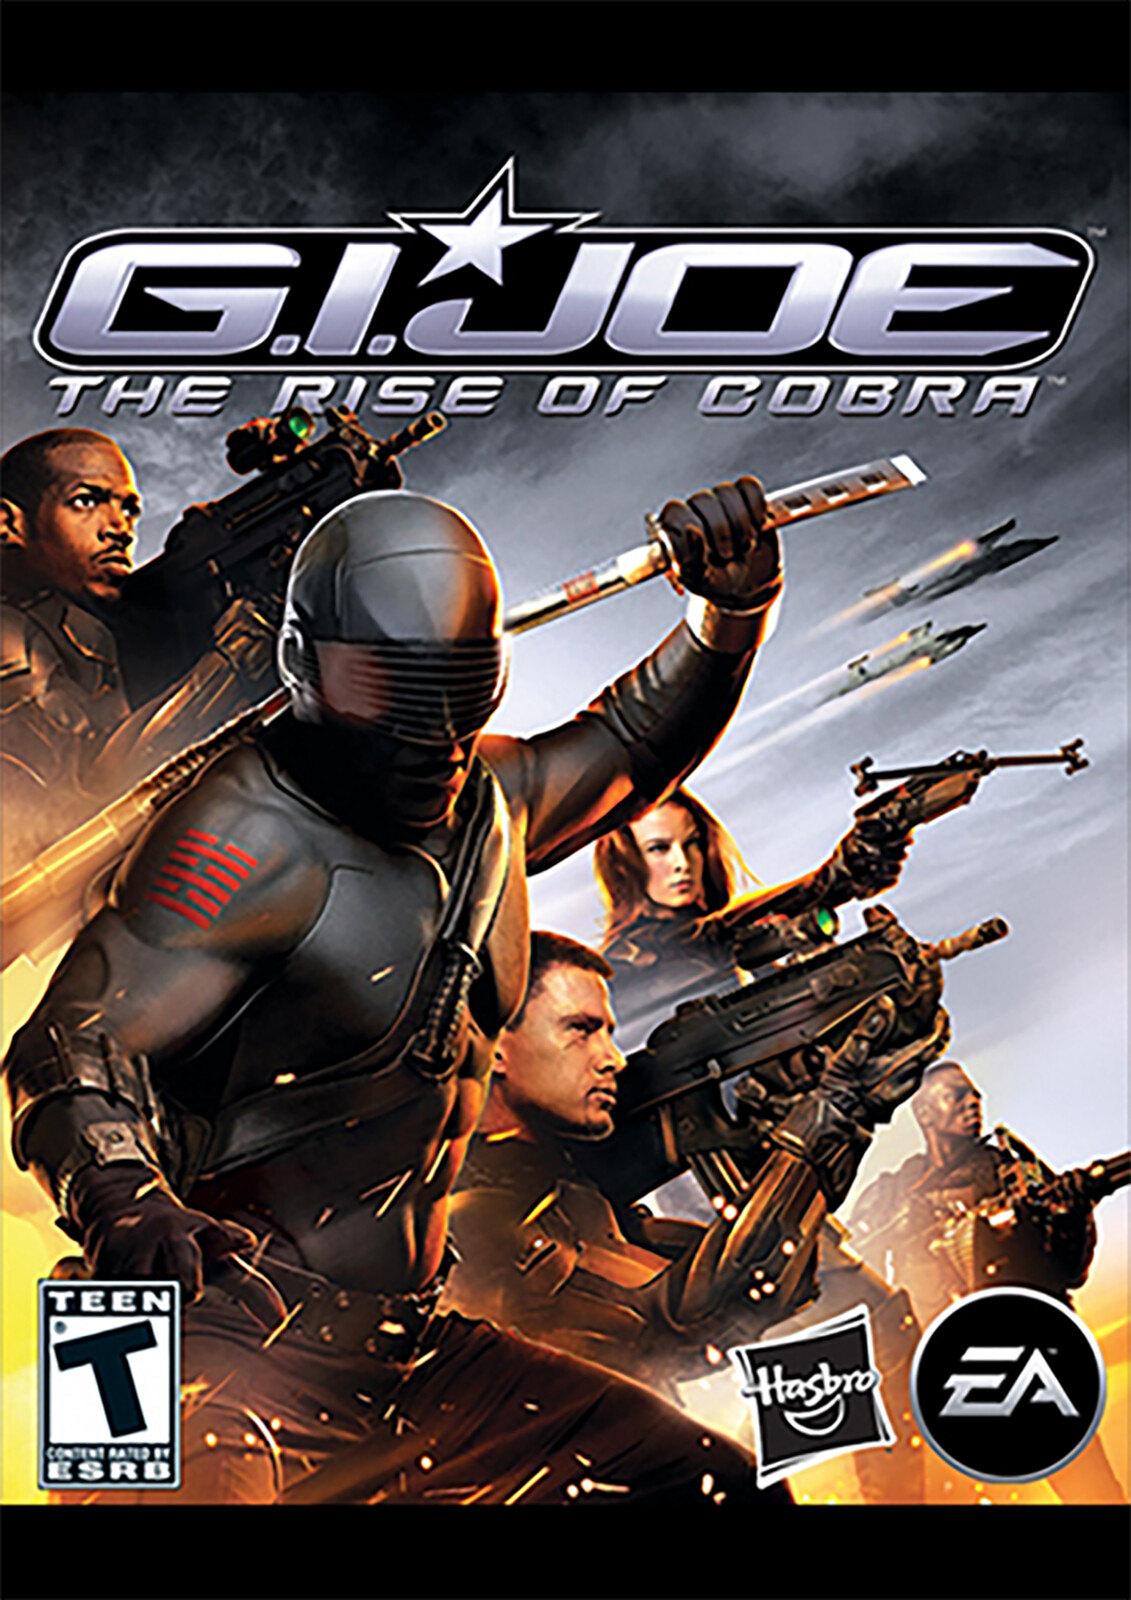 GIJOE: The Rise Of Cobra